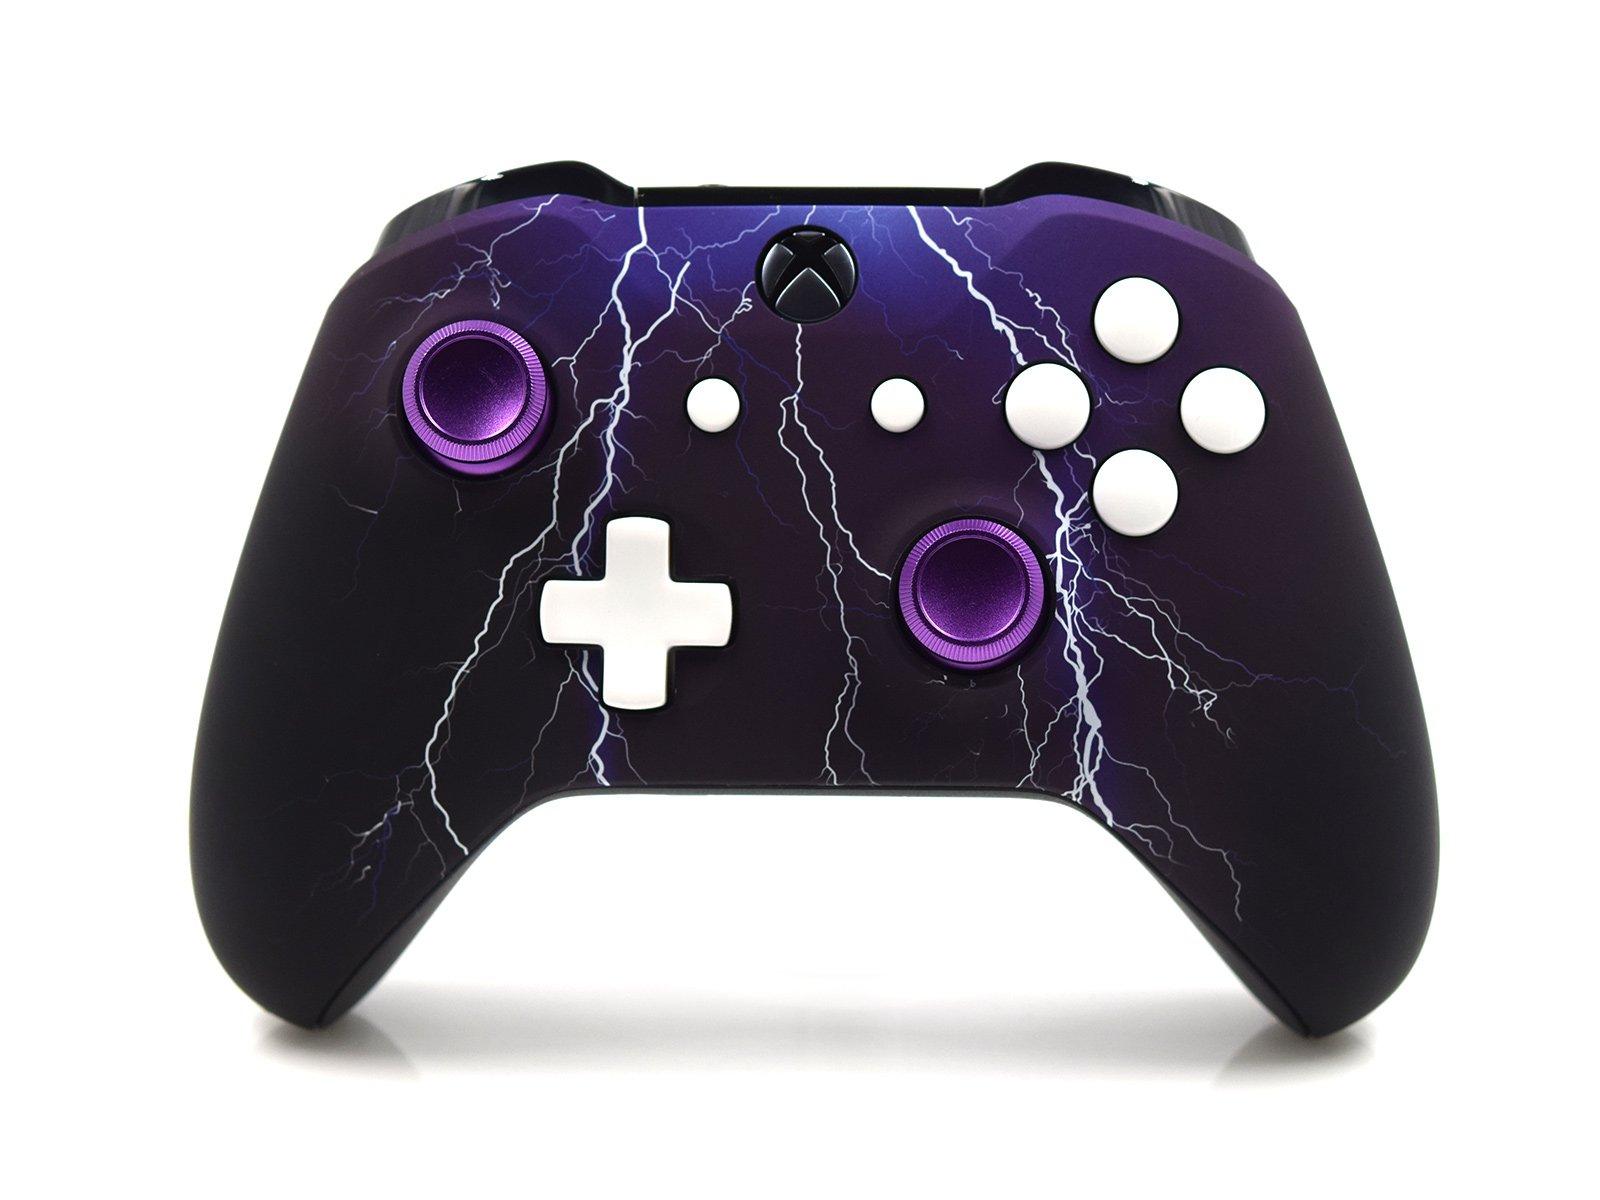 Custom Xbox One S Controller - Violet Lightning